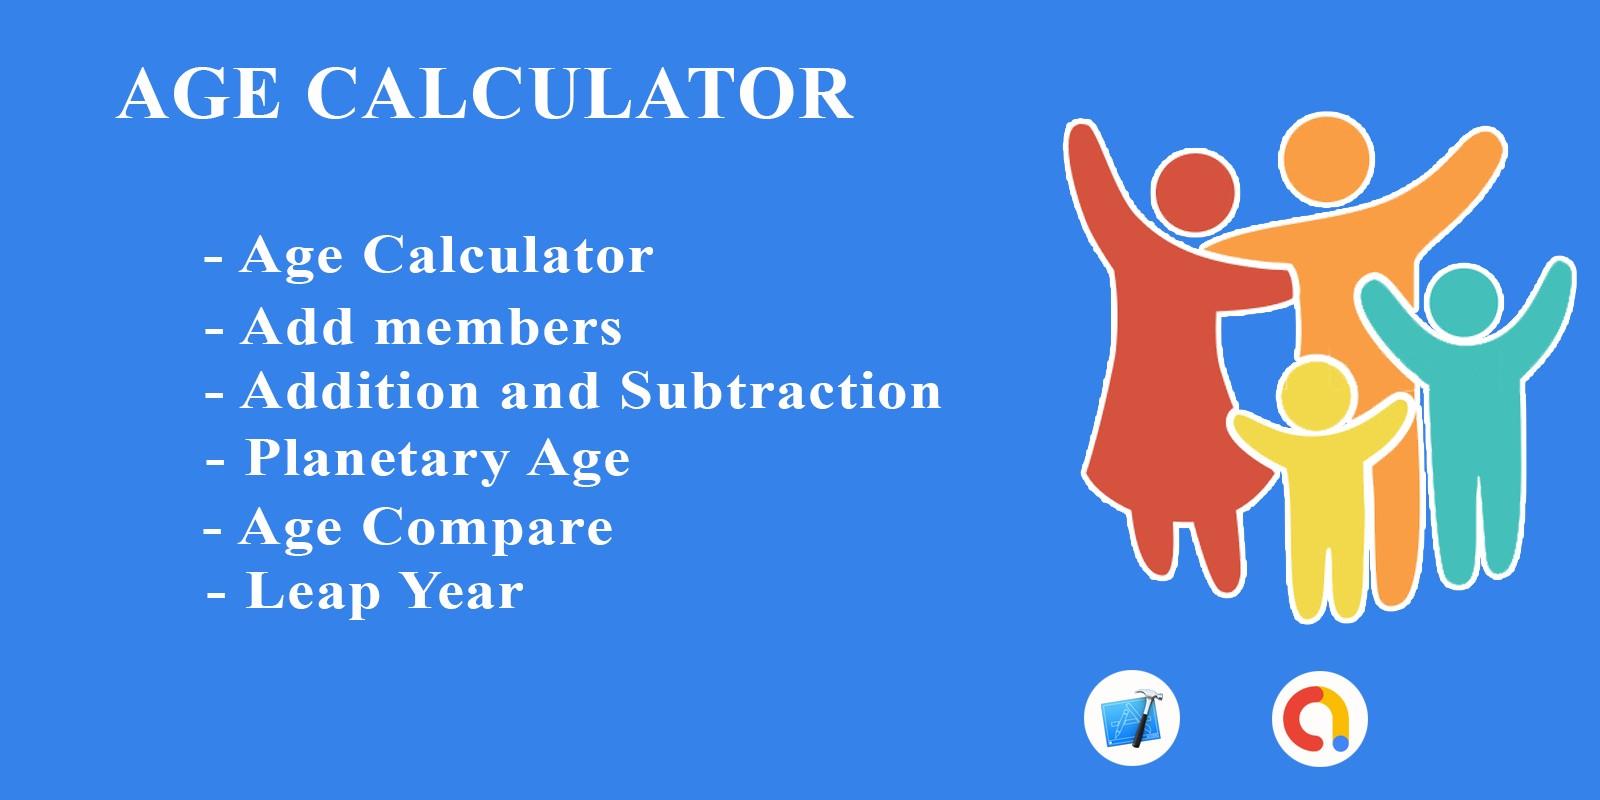 Age Calculator - iOS Application Source Code